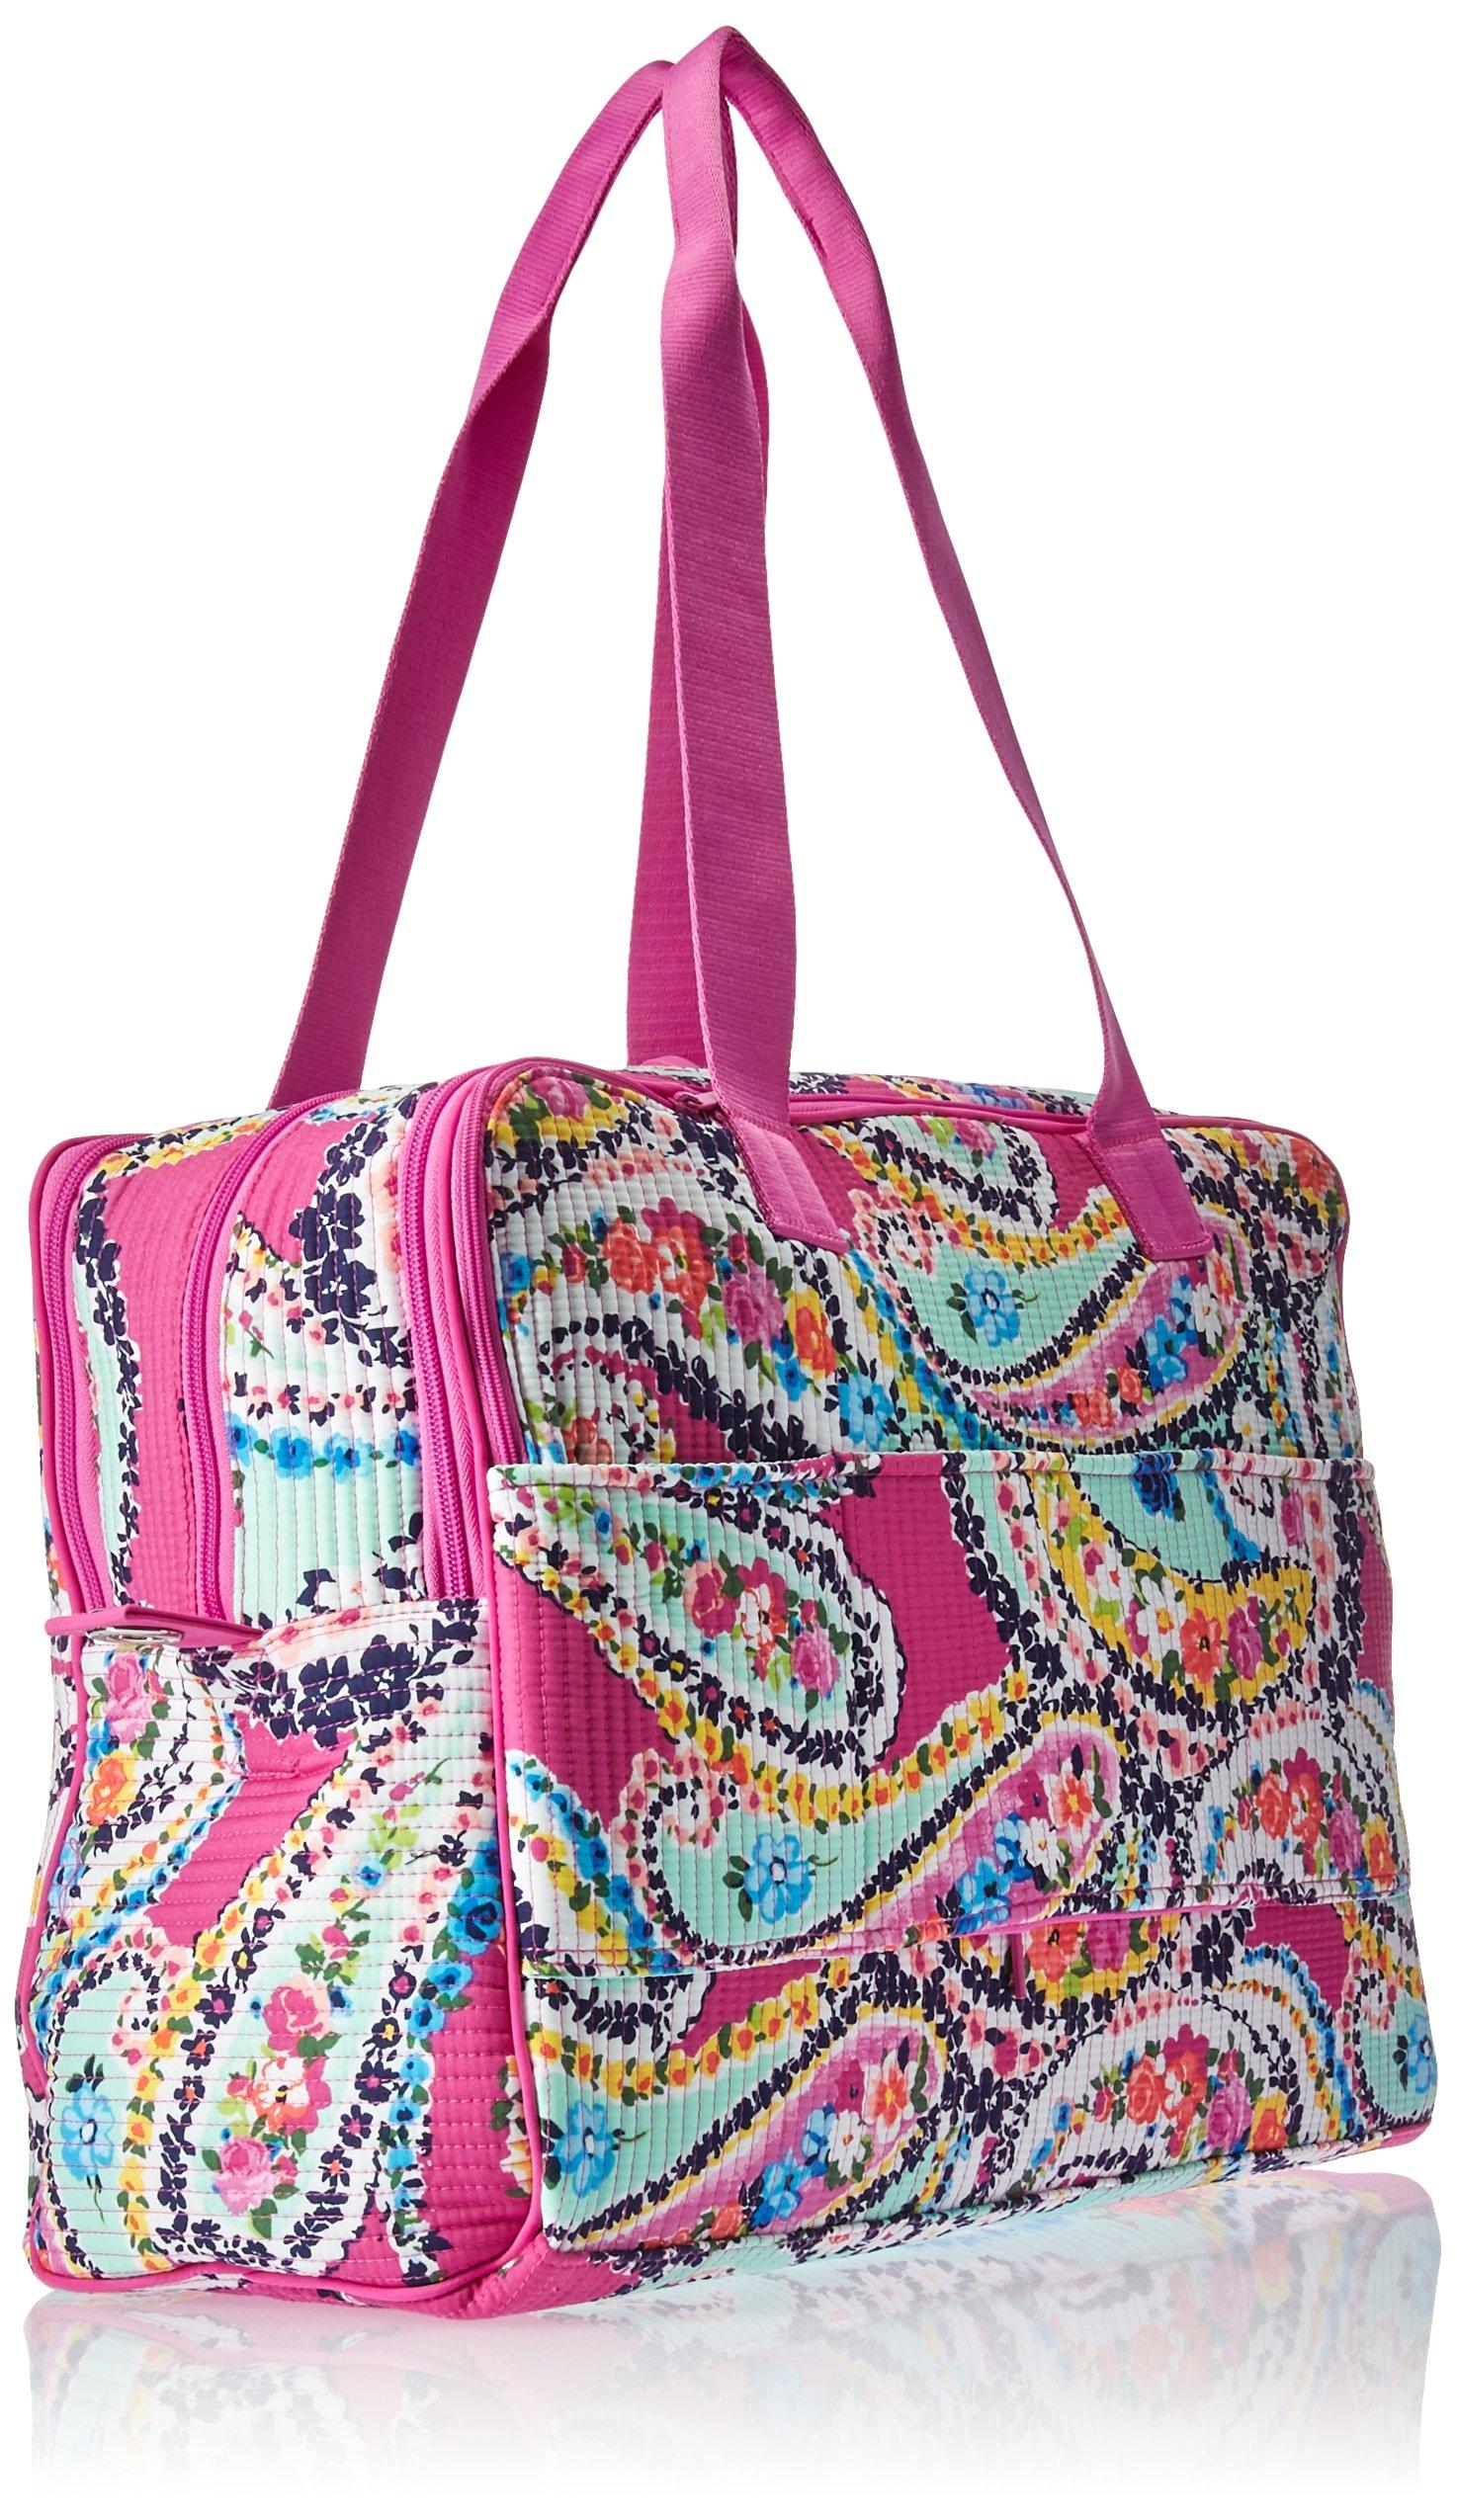 Vera Bradley Iconic Deluxe Weekender Travel Bag, Signature Cotton by Vera Bradley (Image #2)